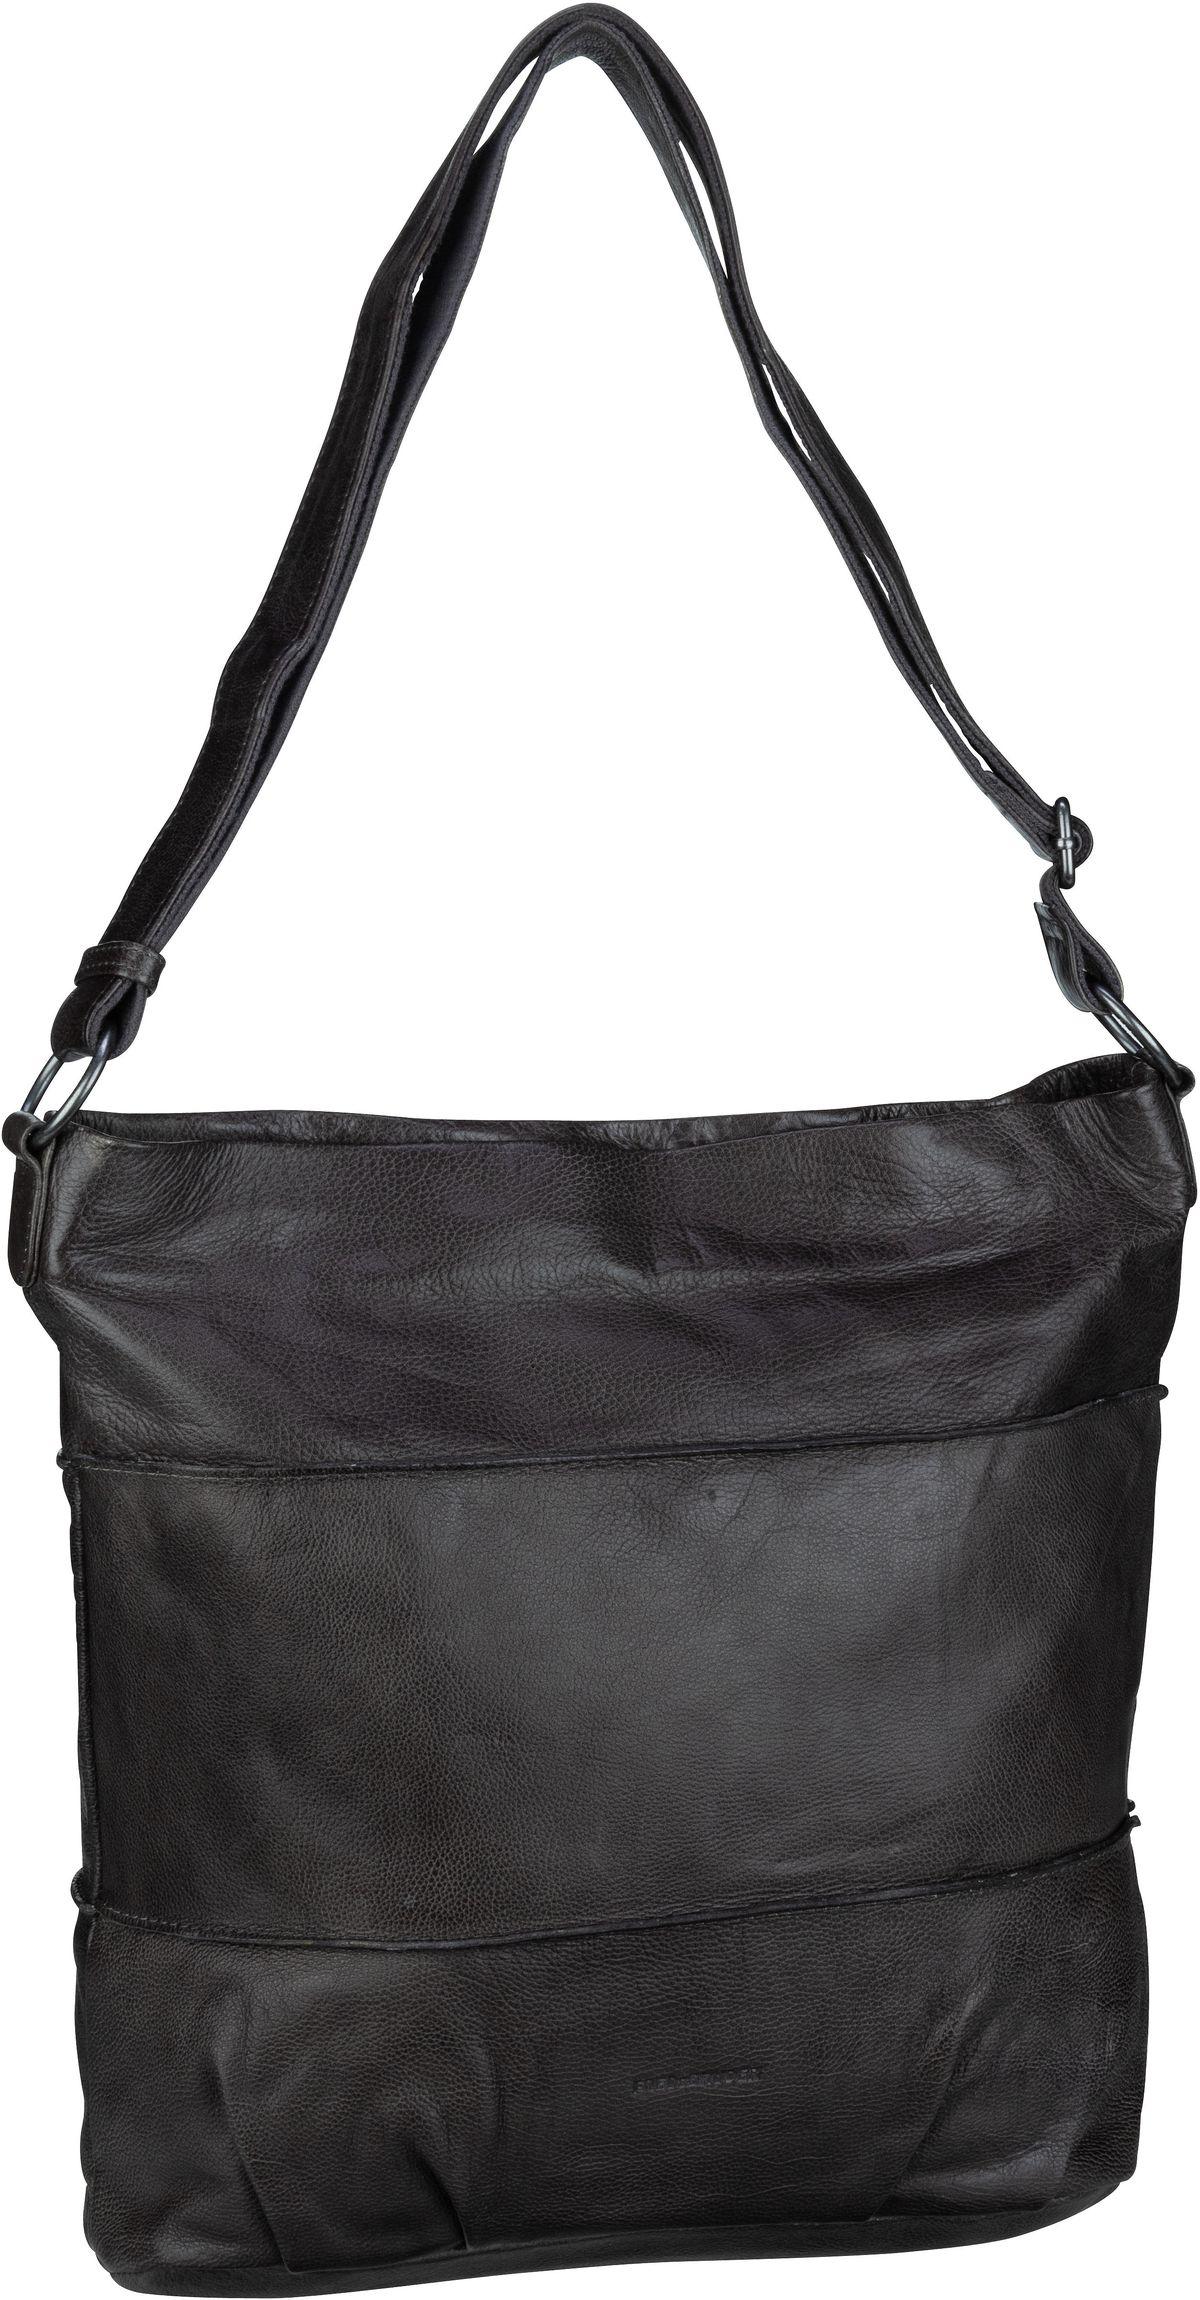 Handtasche Oh Crowny! Antracite